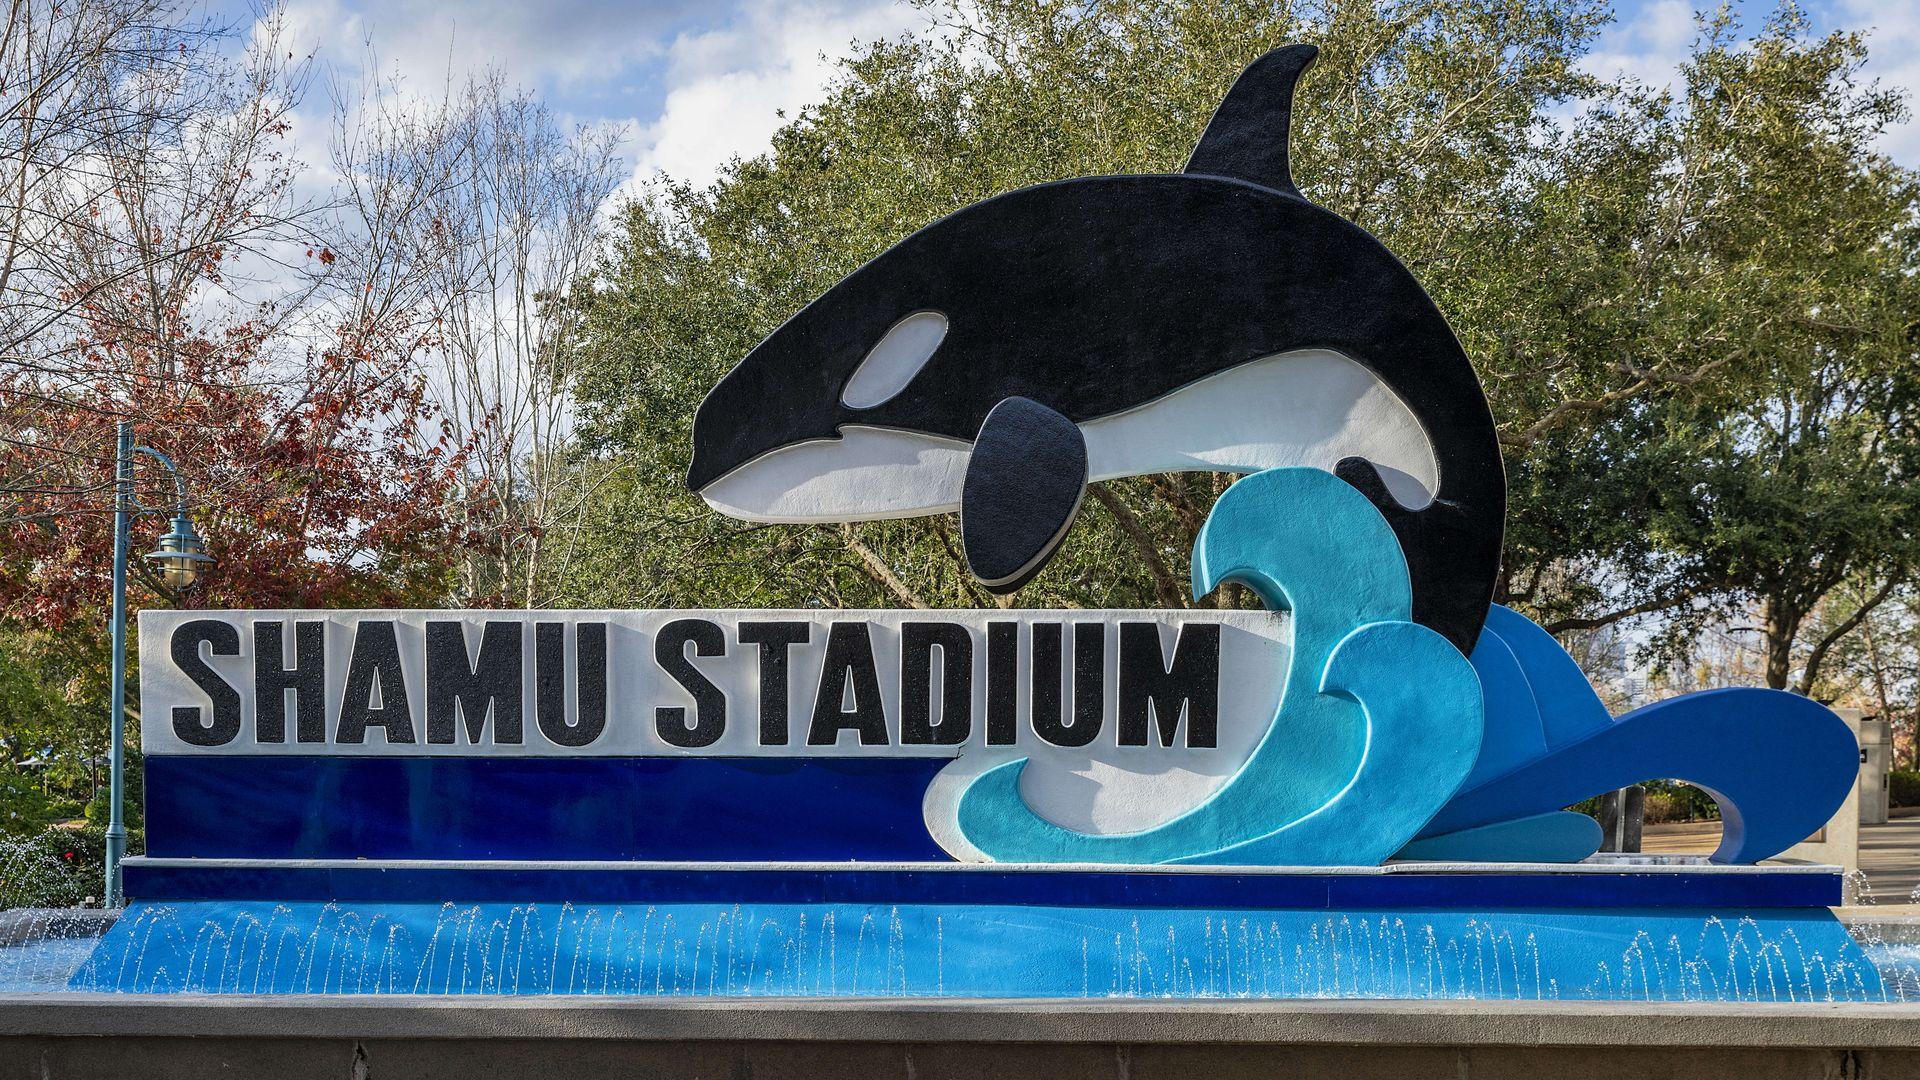 Shamu Stadium at Seaworld marine park, Orlando Florida. (Photo by John Greim/LightRocket via Getty Images)